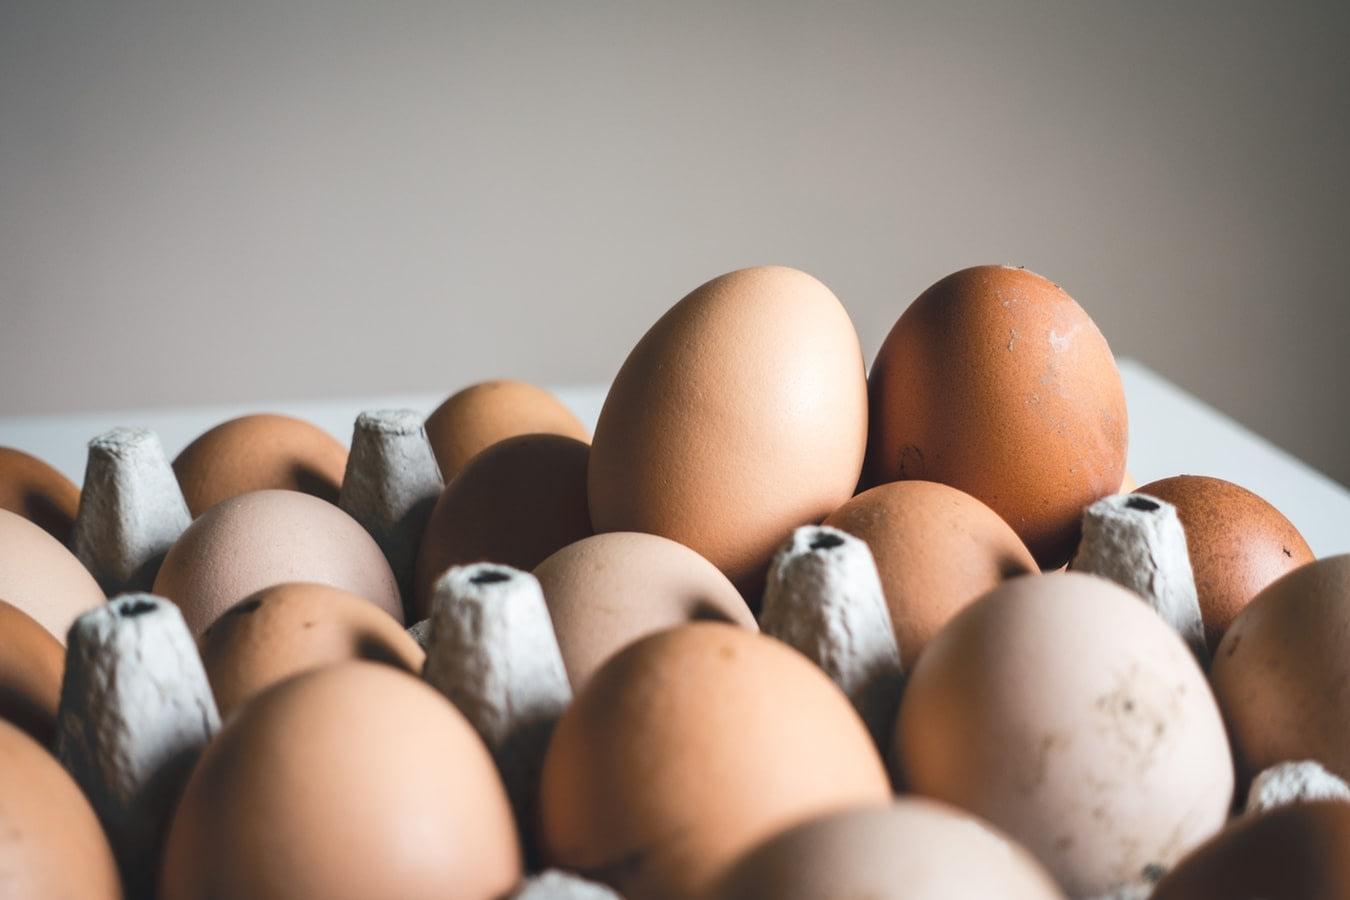 Brown whole eggs inside a cardboard egg holder